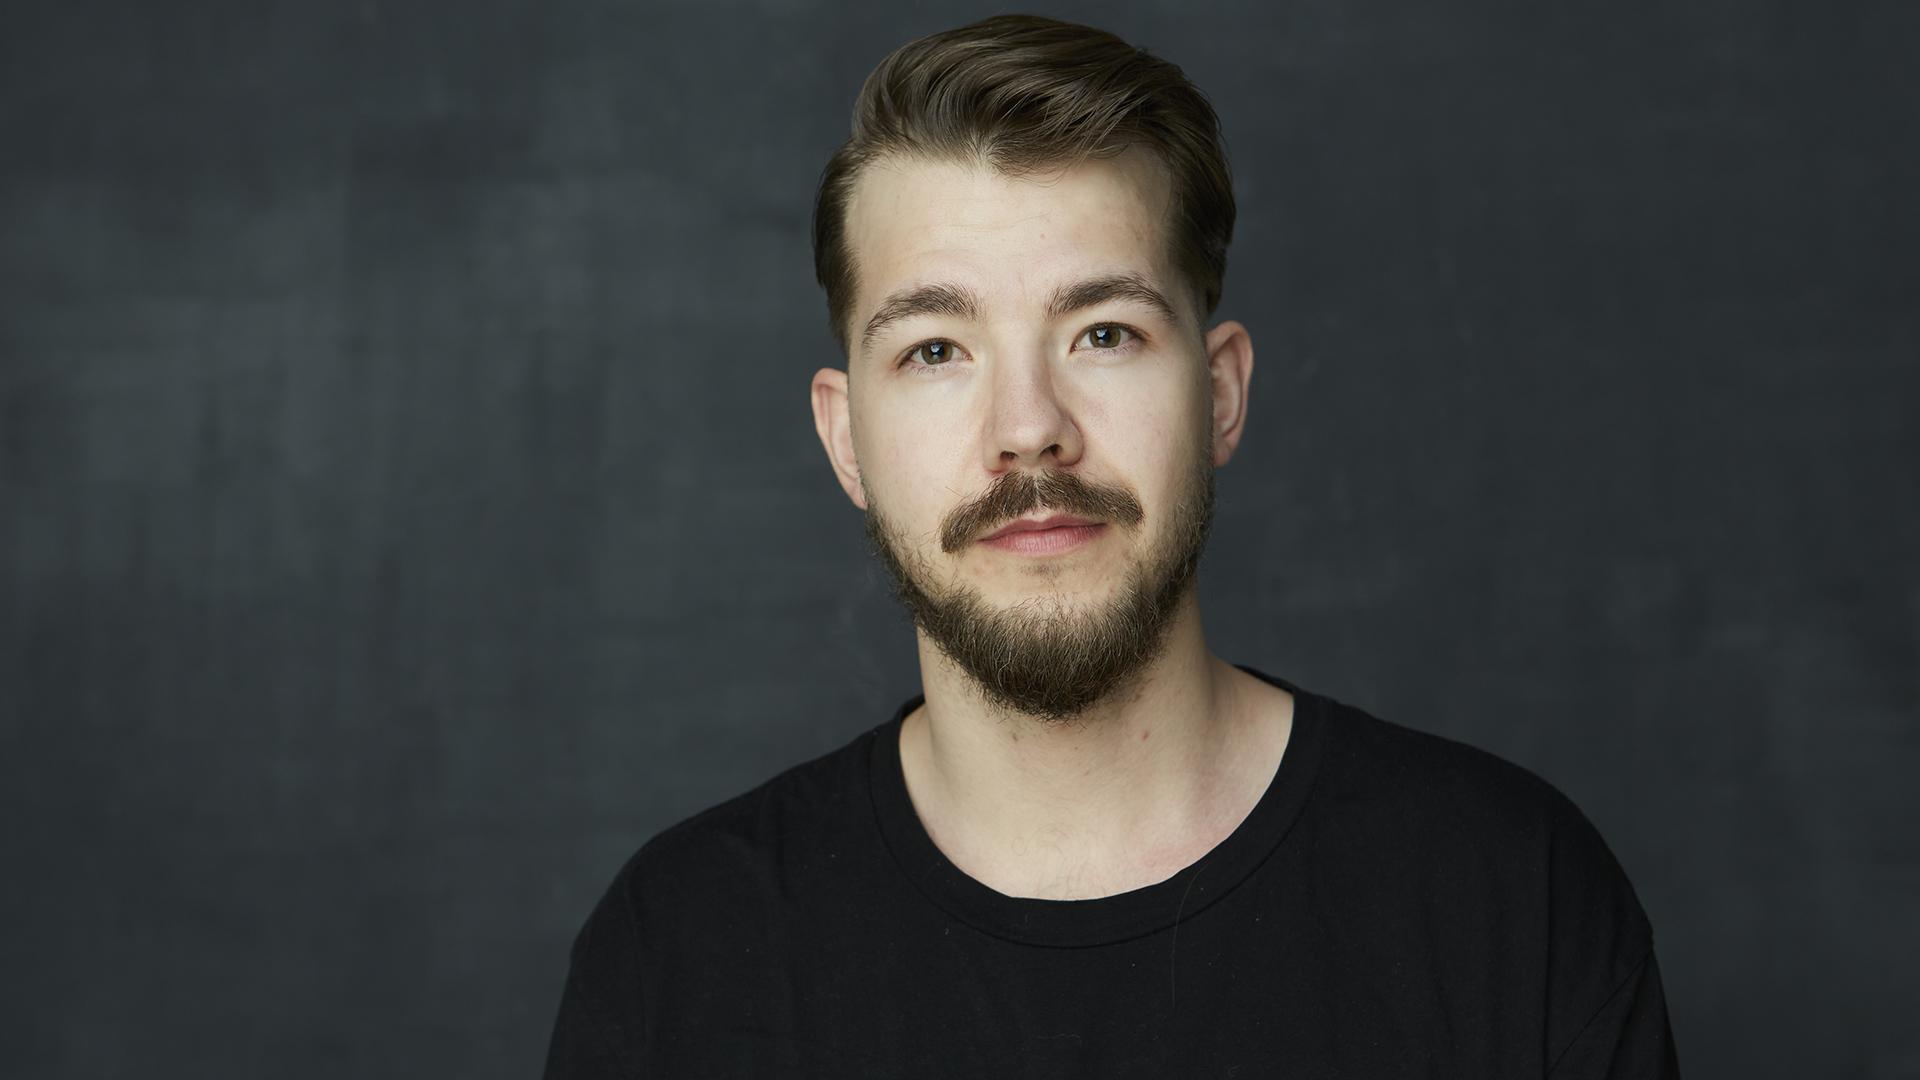 Joel Härkönen